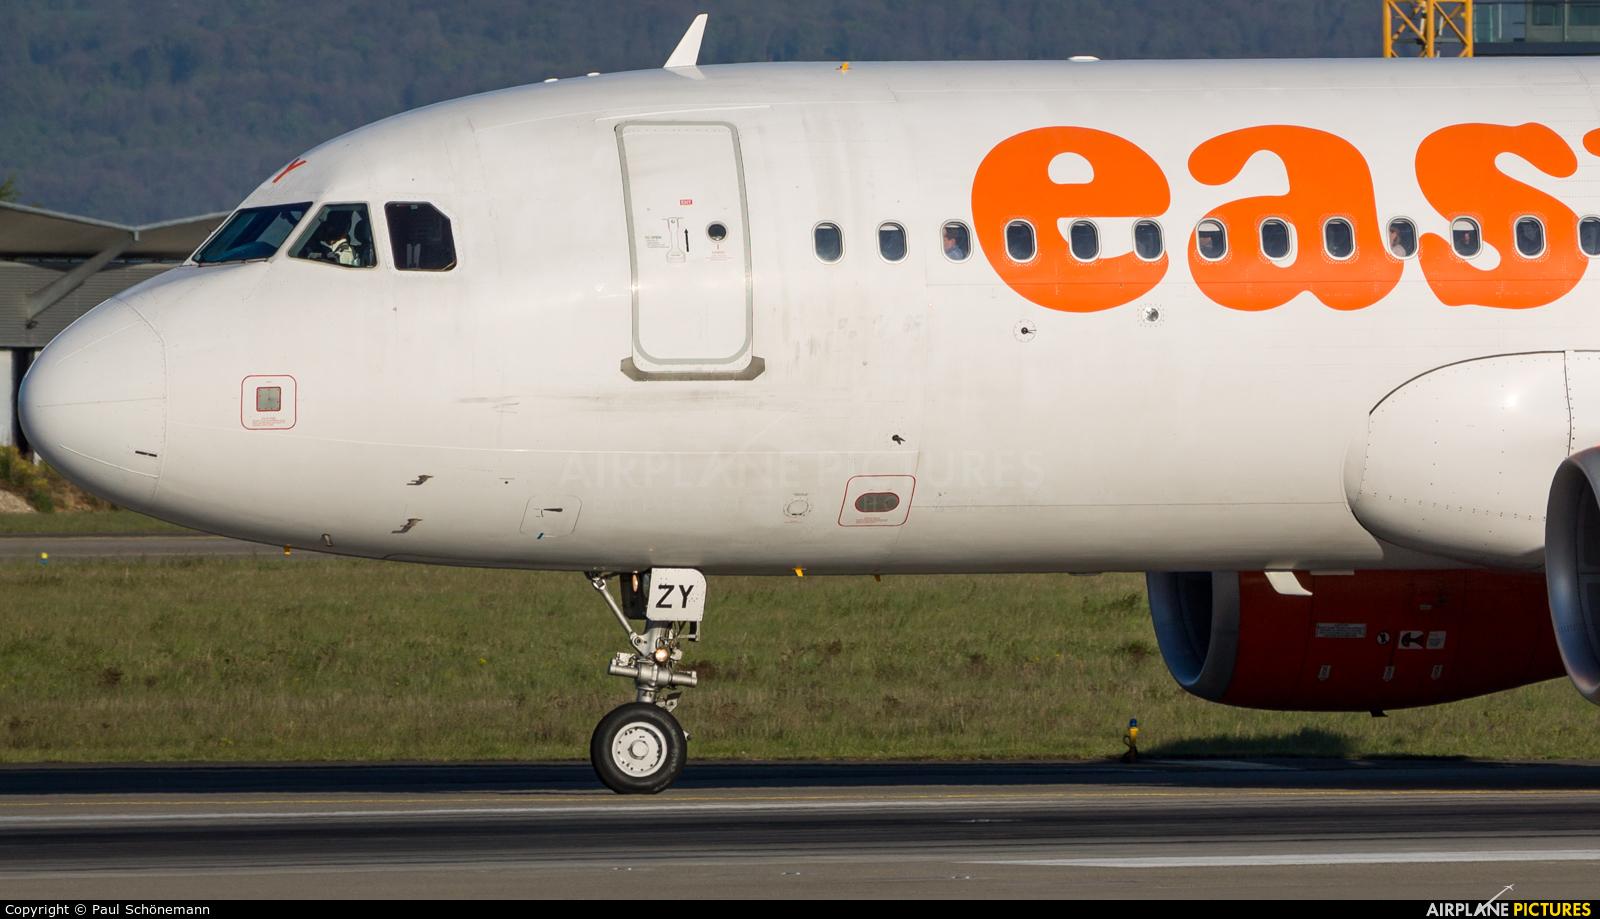 easyJet Switzerland HB-JZY aircraft at Basel - Mulhouse- Euro